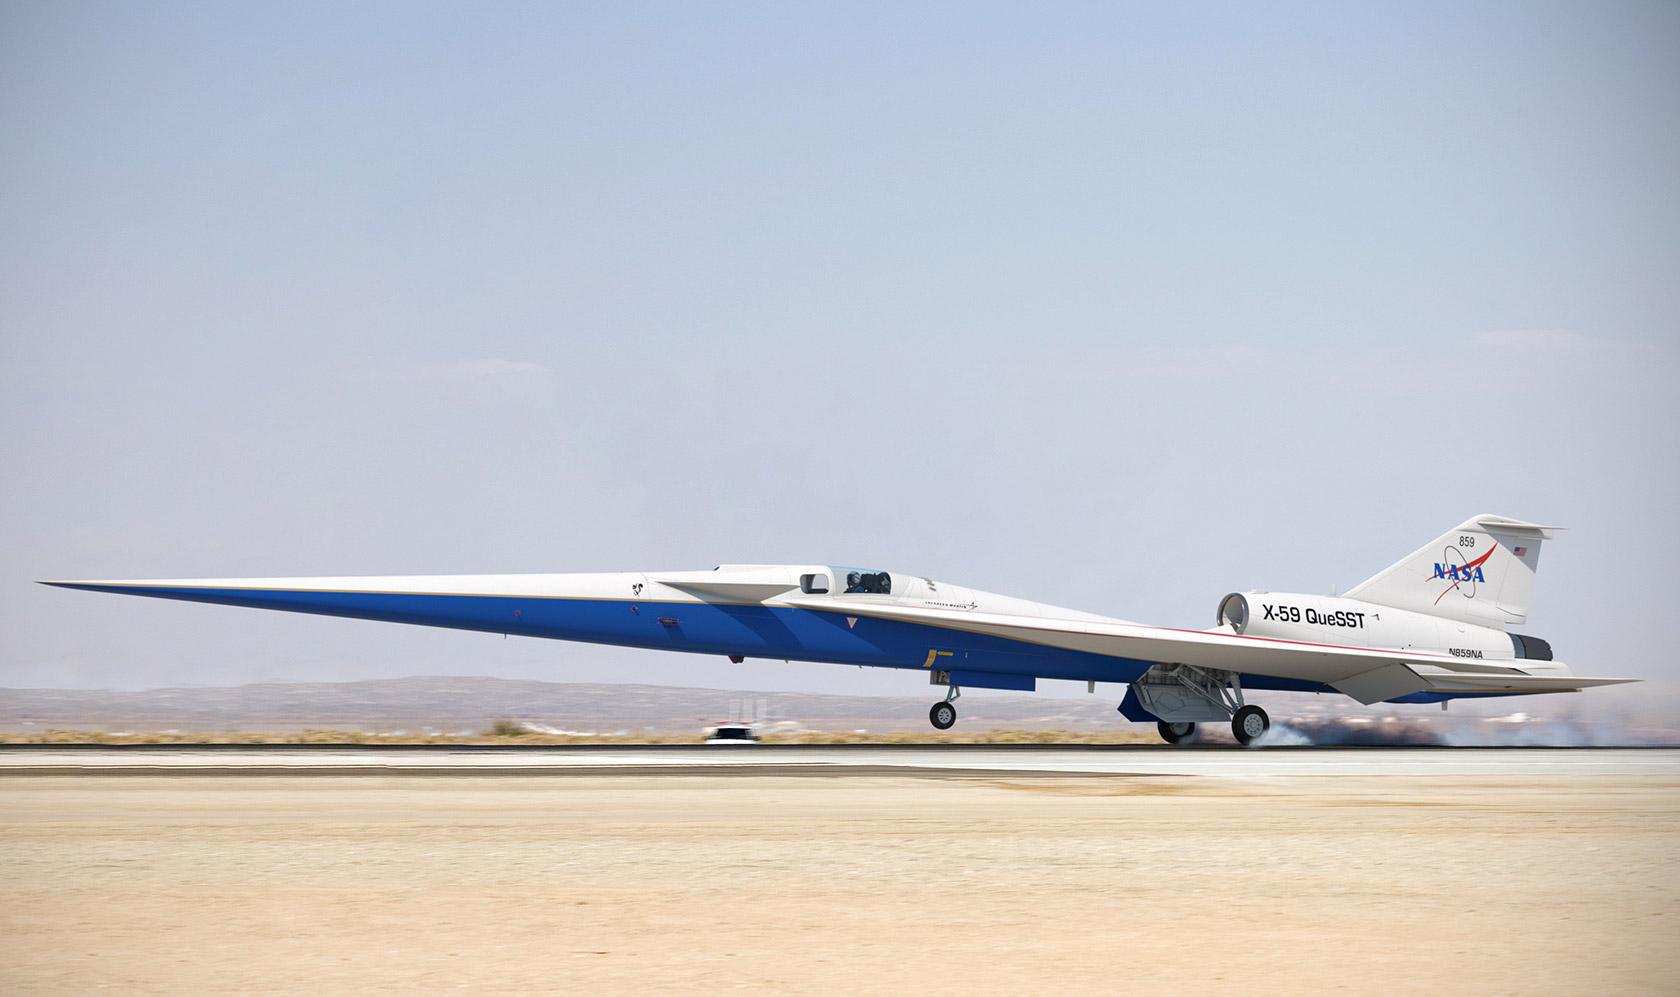 NASA Lockheed Martin X-59 QueSST